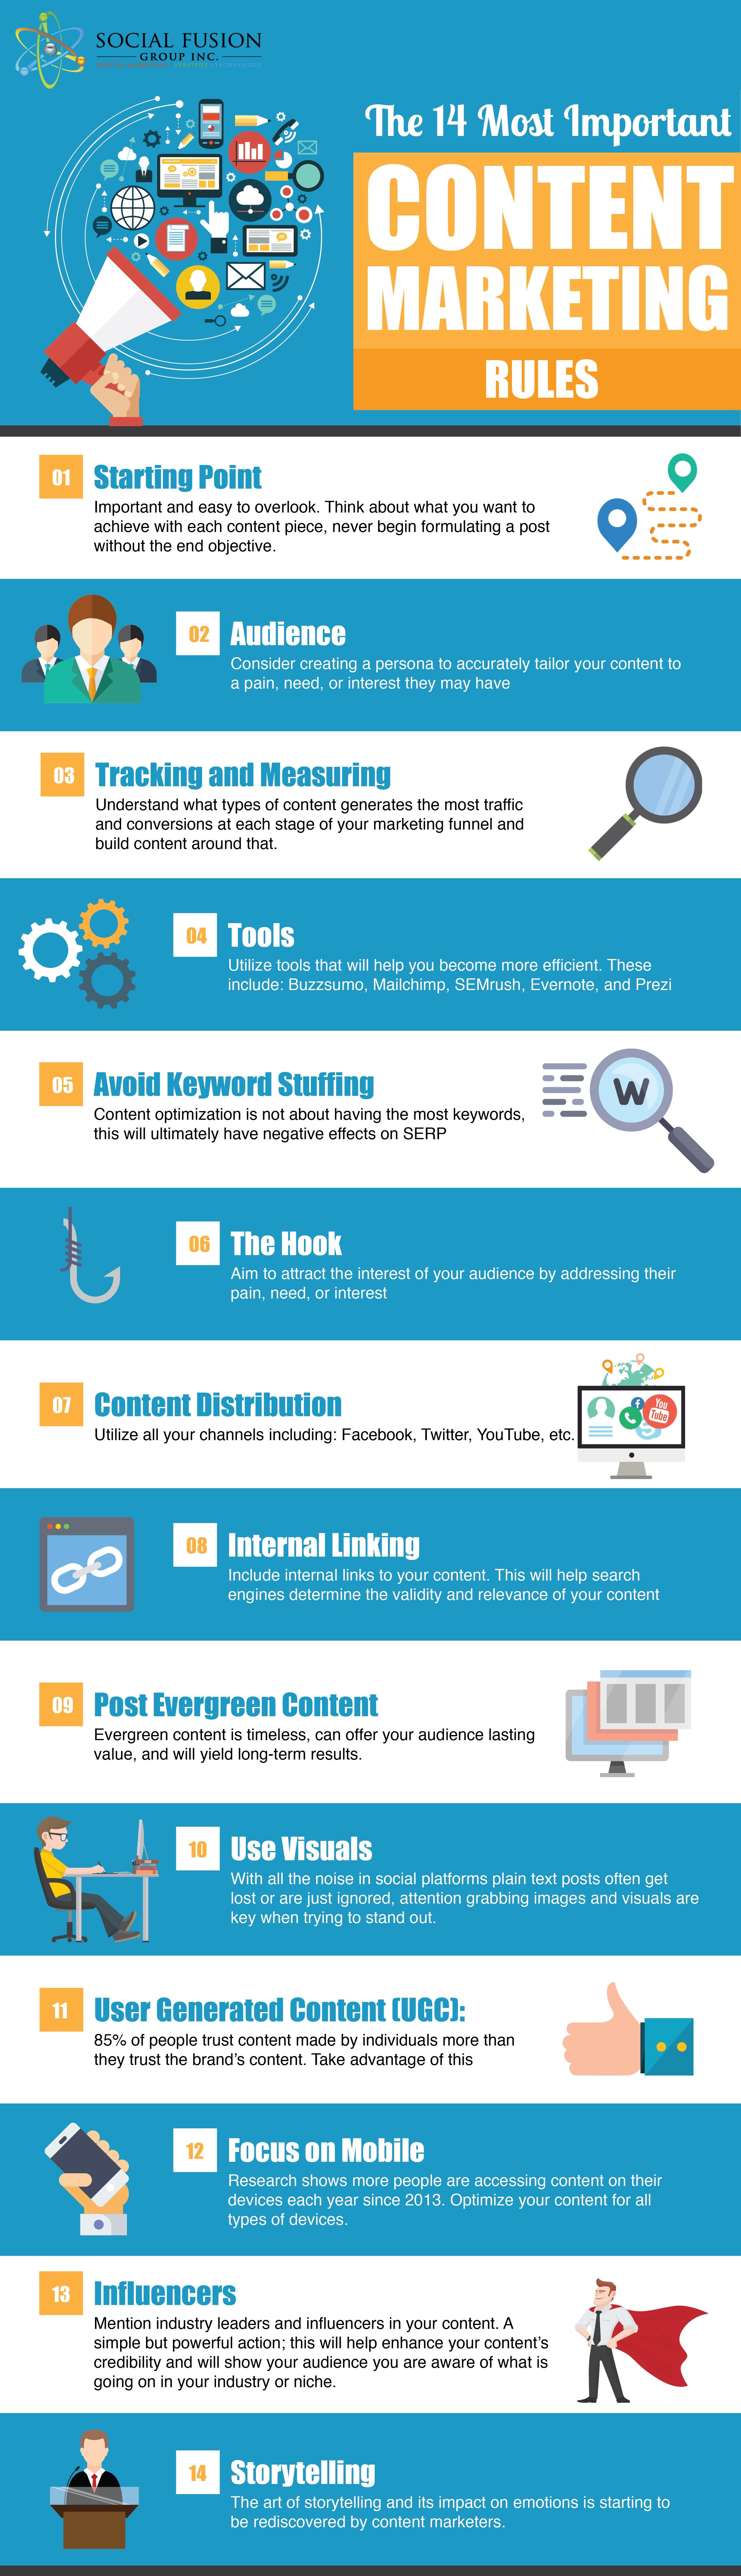 Content Marketing Infographic.jpg